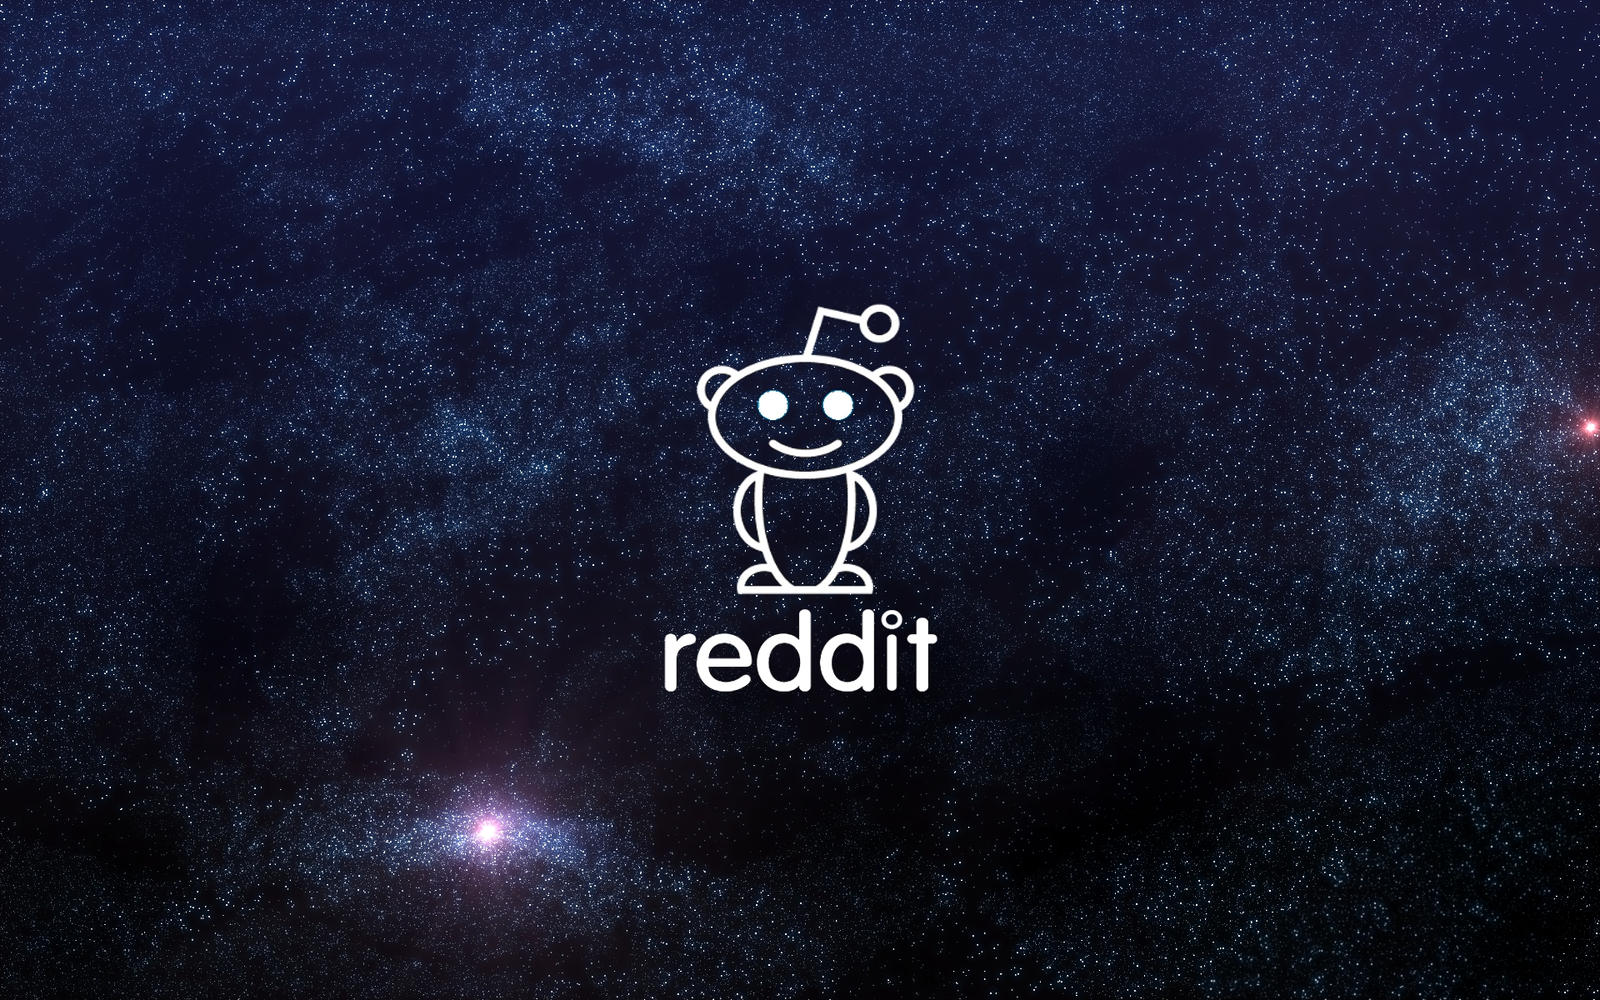 Space Wallpapers Reddit Top Wallpapers